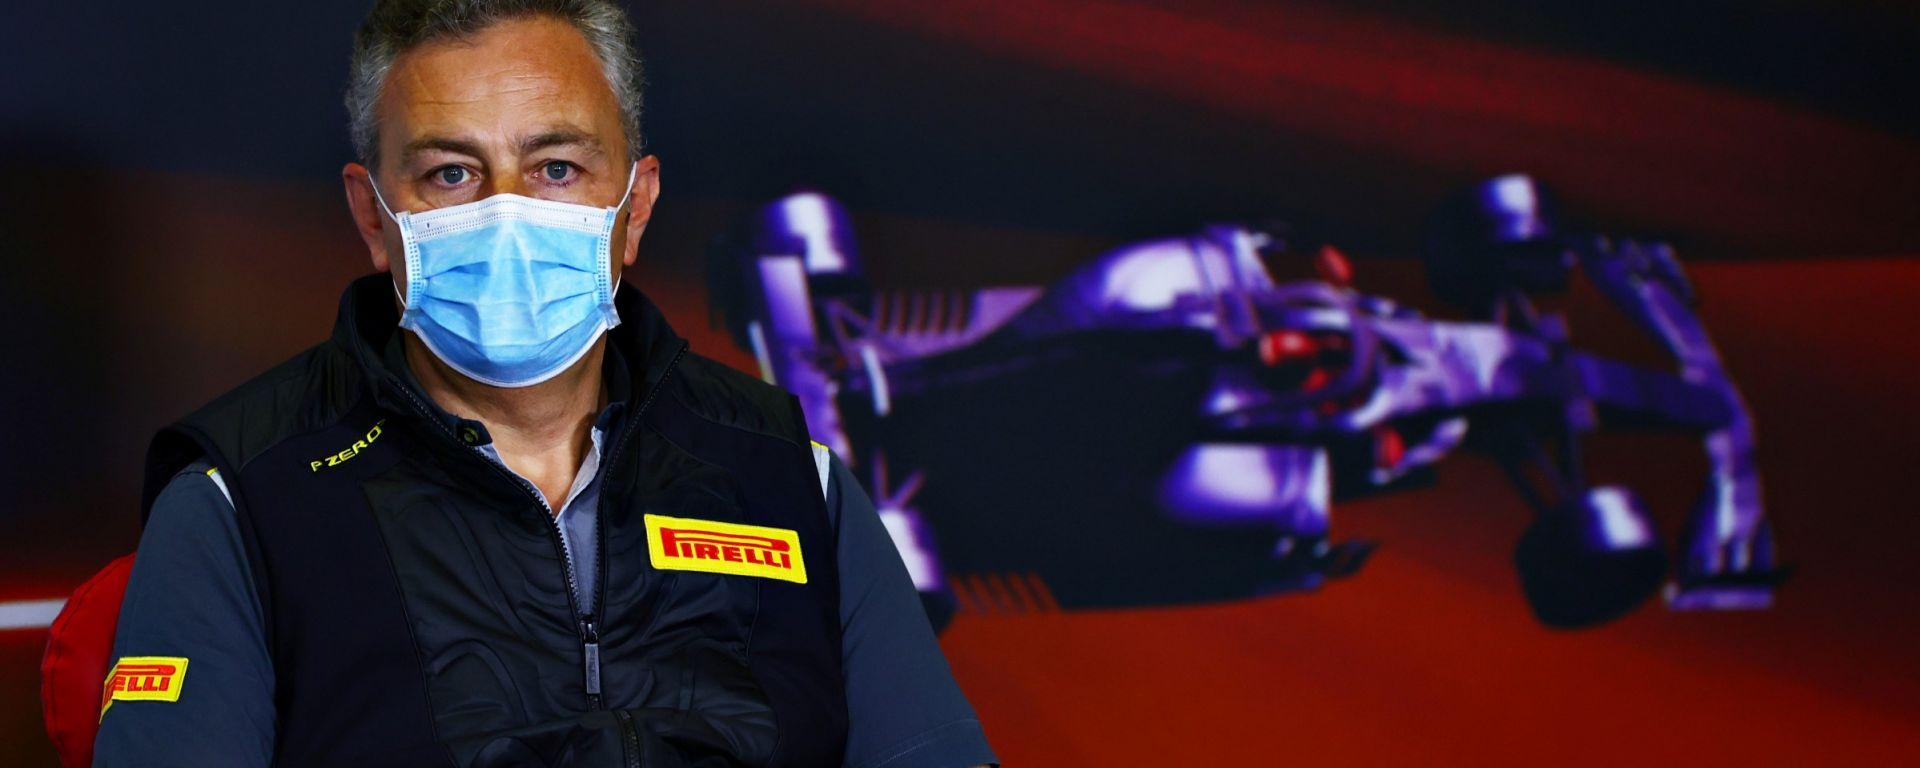 F1 2021: Mario Isola (Pirelli)